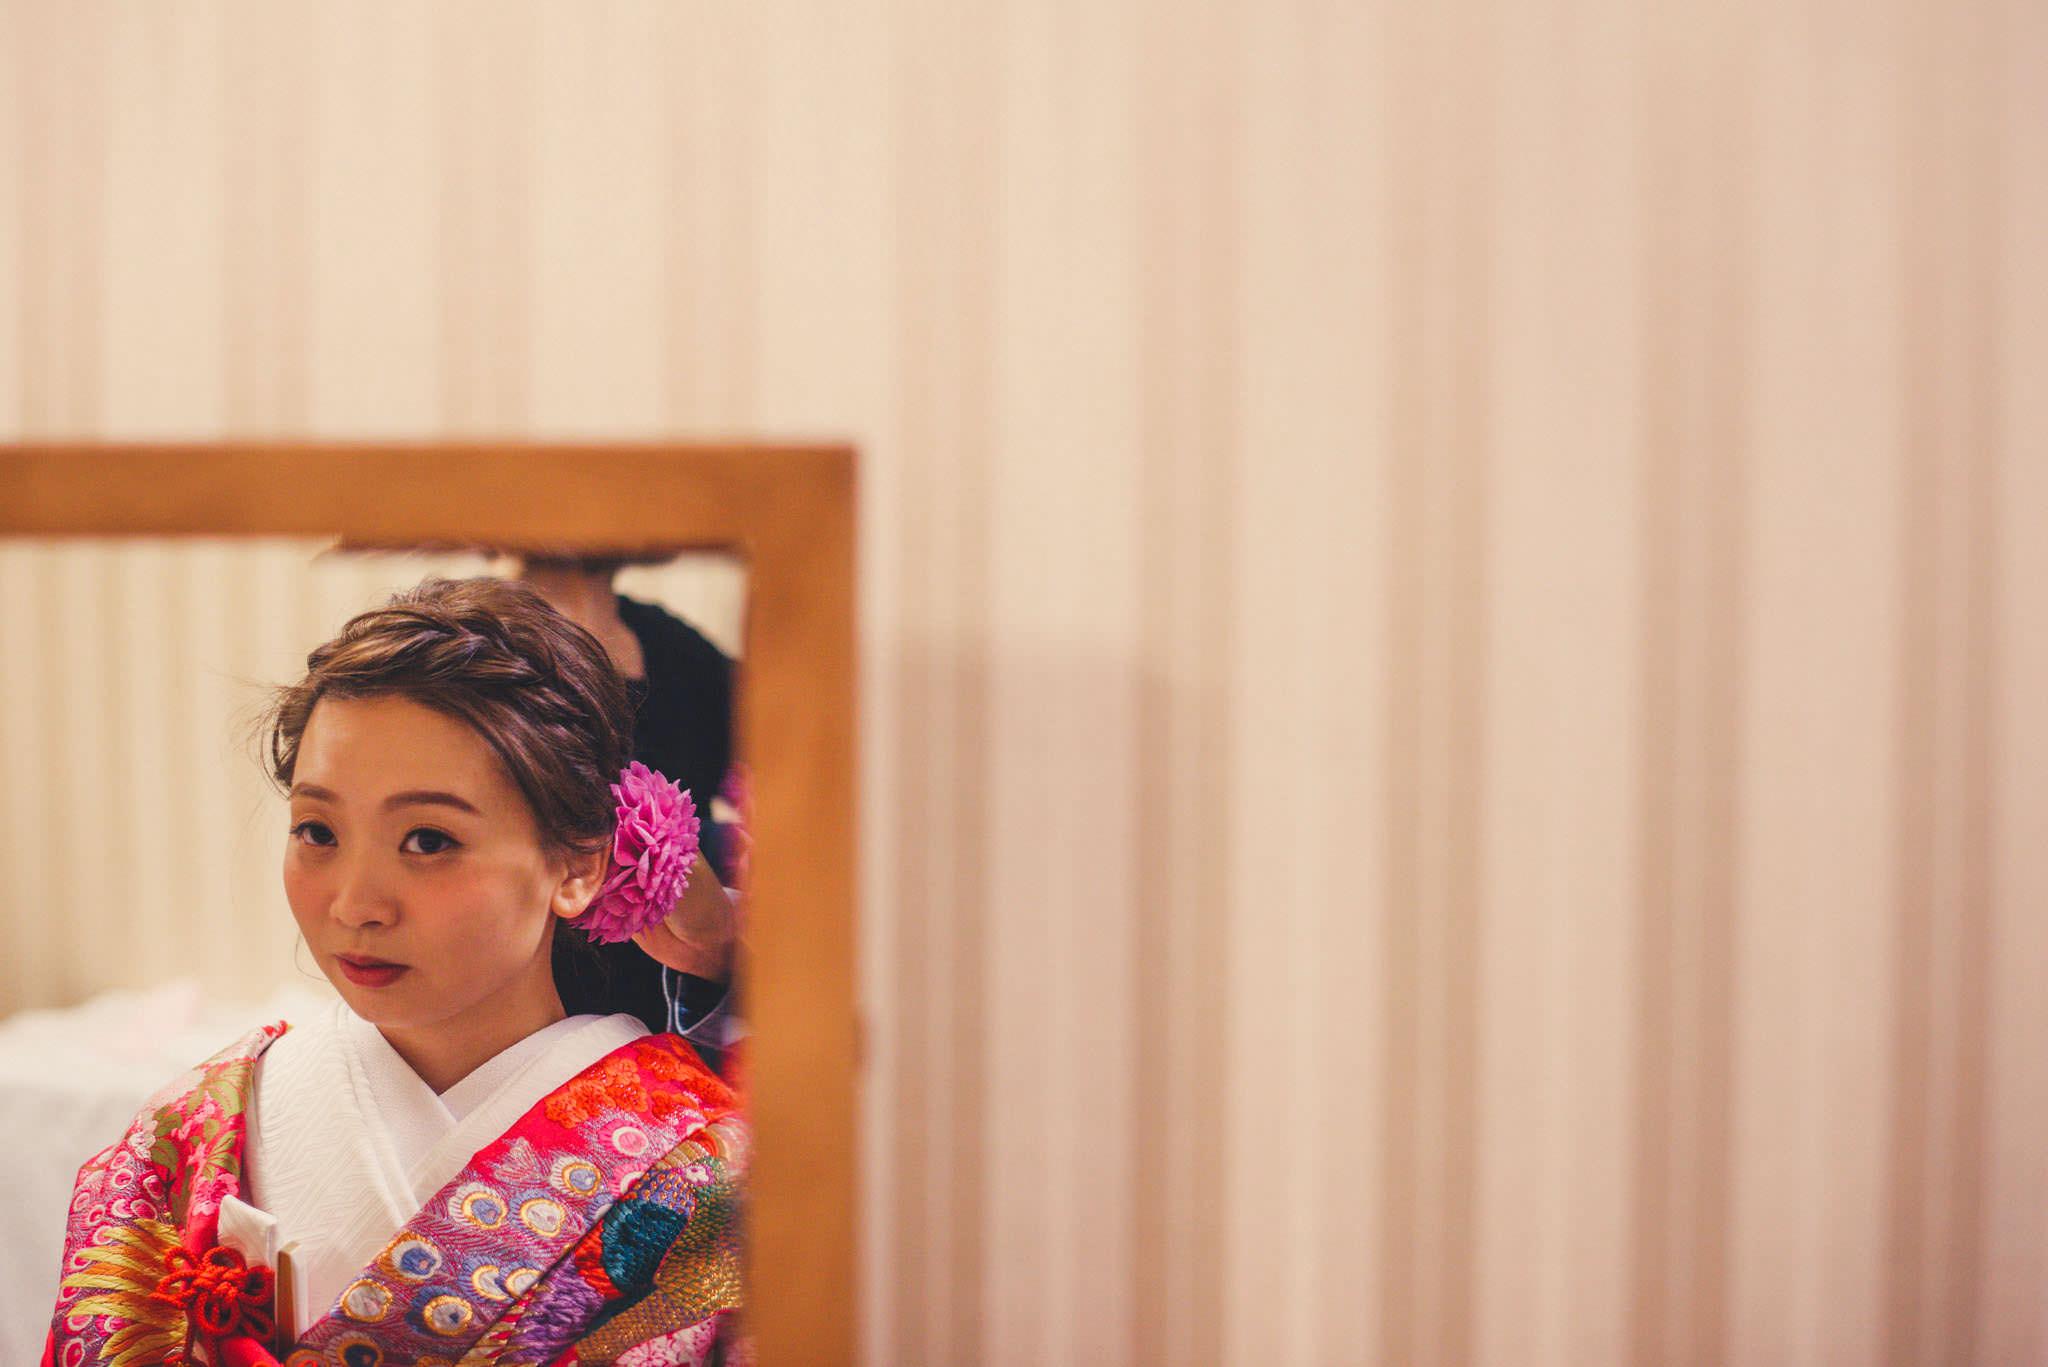 japan-wedding-photography-by-roberto-panciatici-photography-18